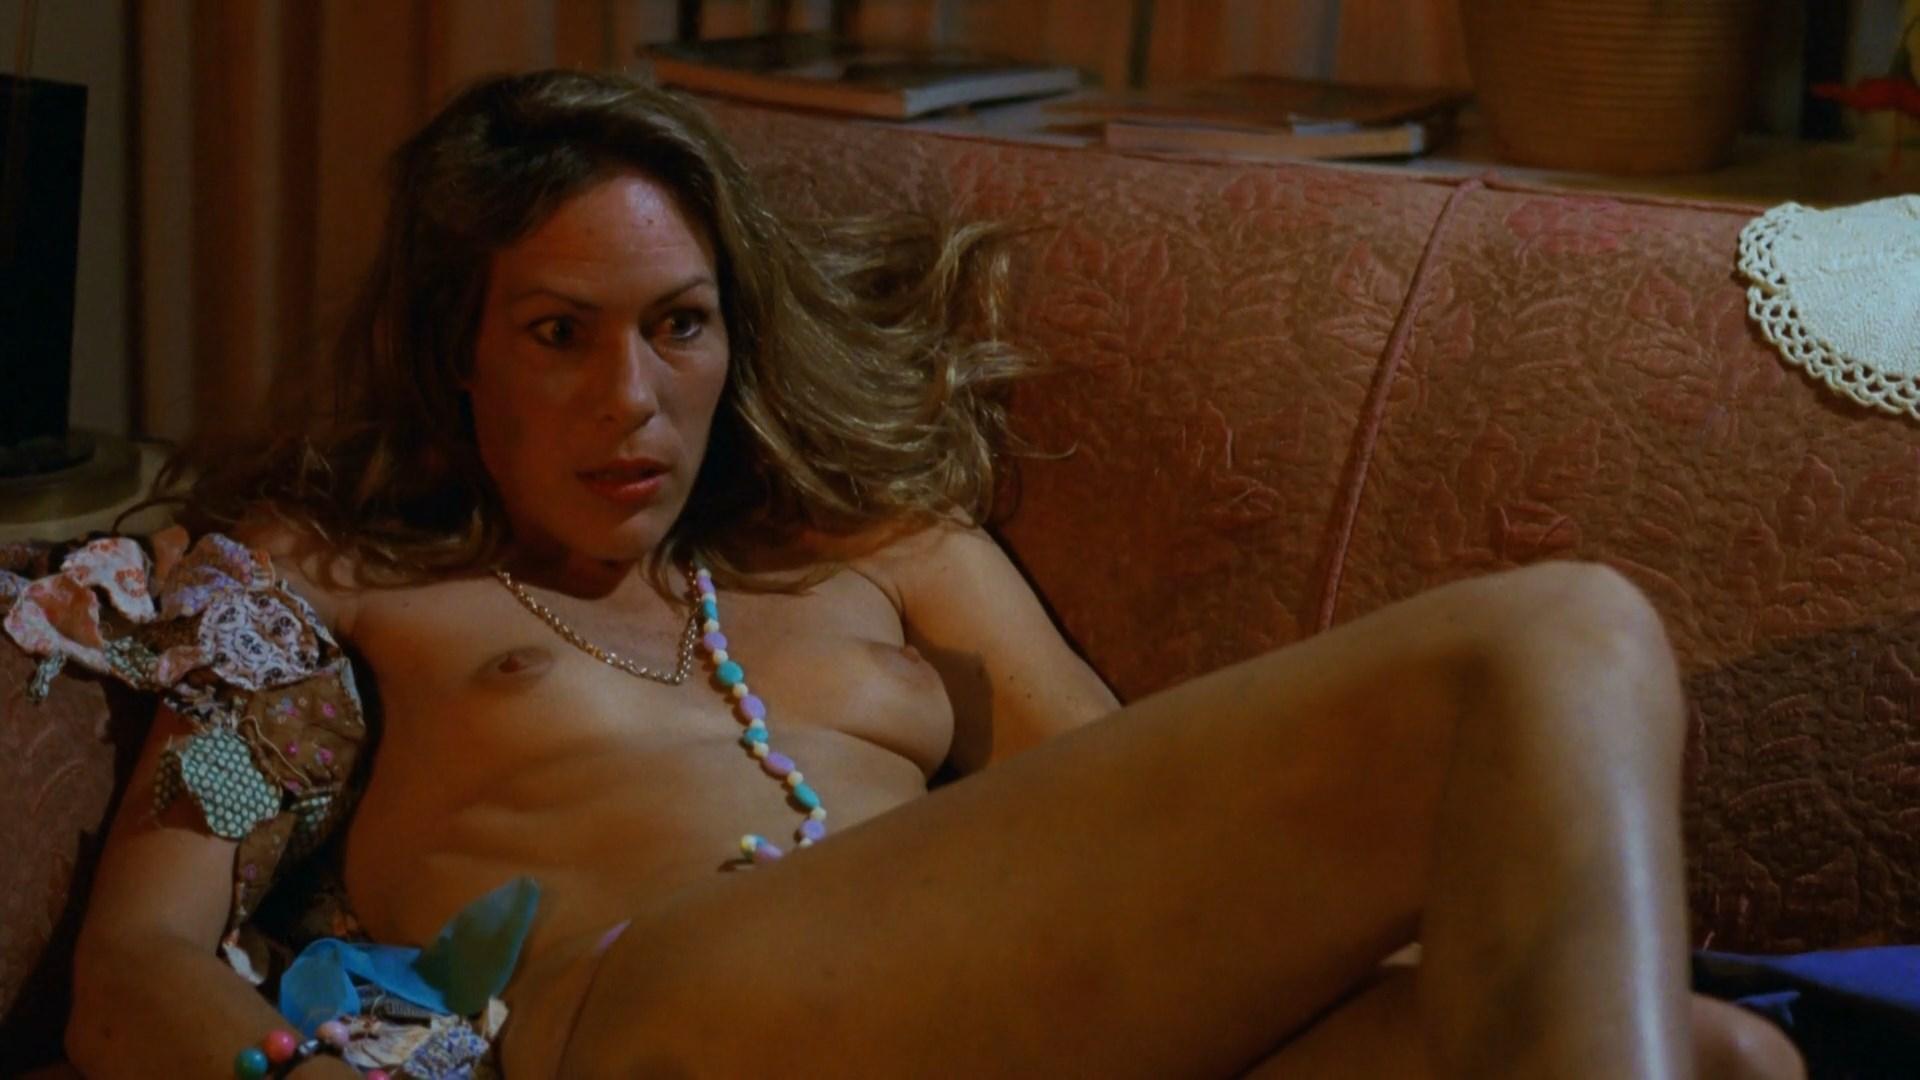 Mary Woronov nude - Eating Raoul (1982)